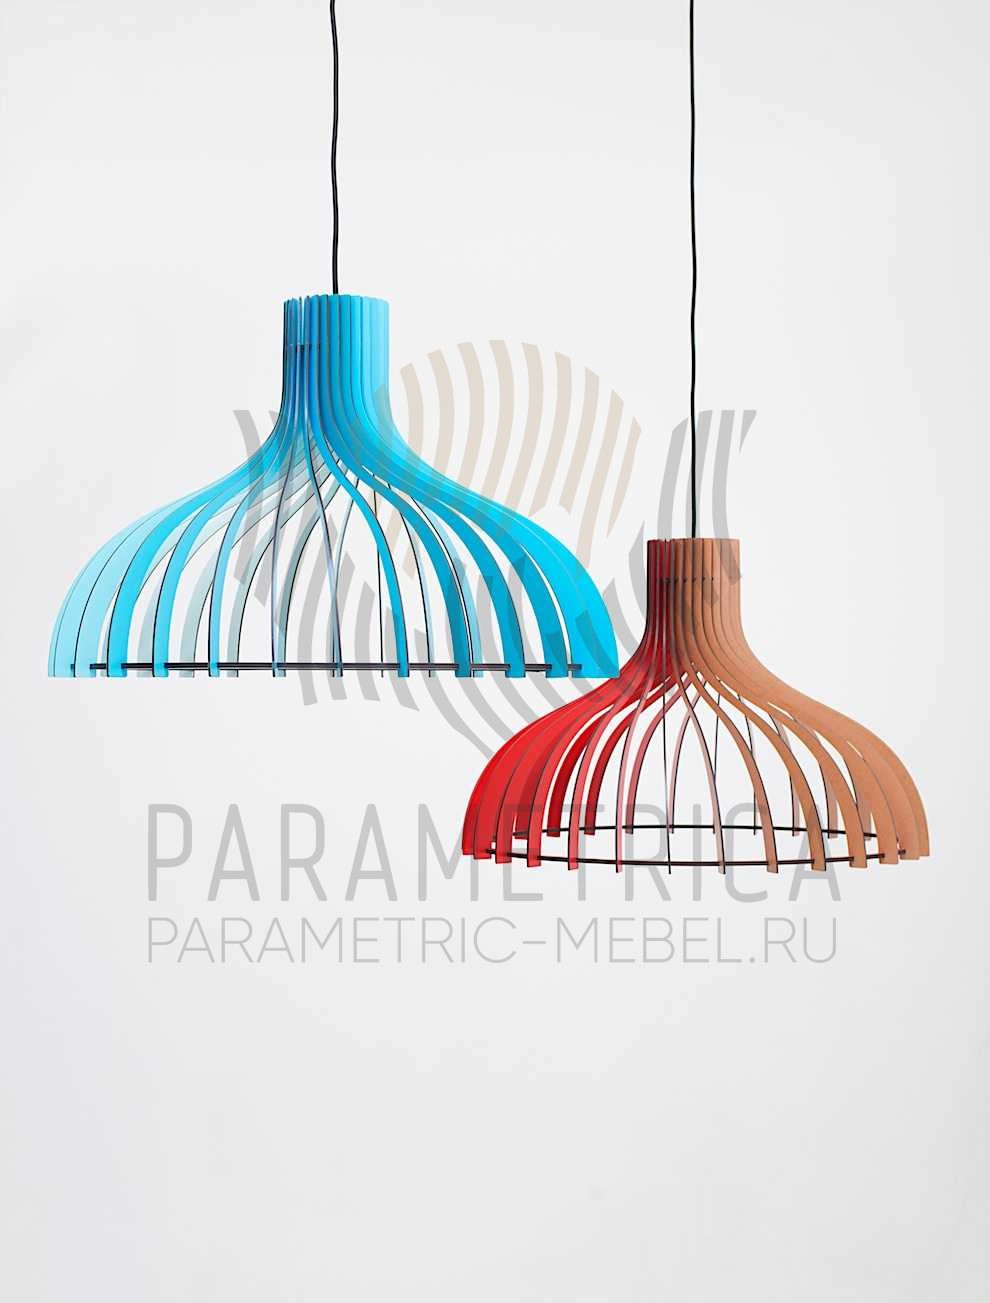 Parametric-mebel Piegatto ANA